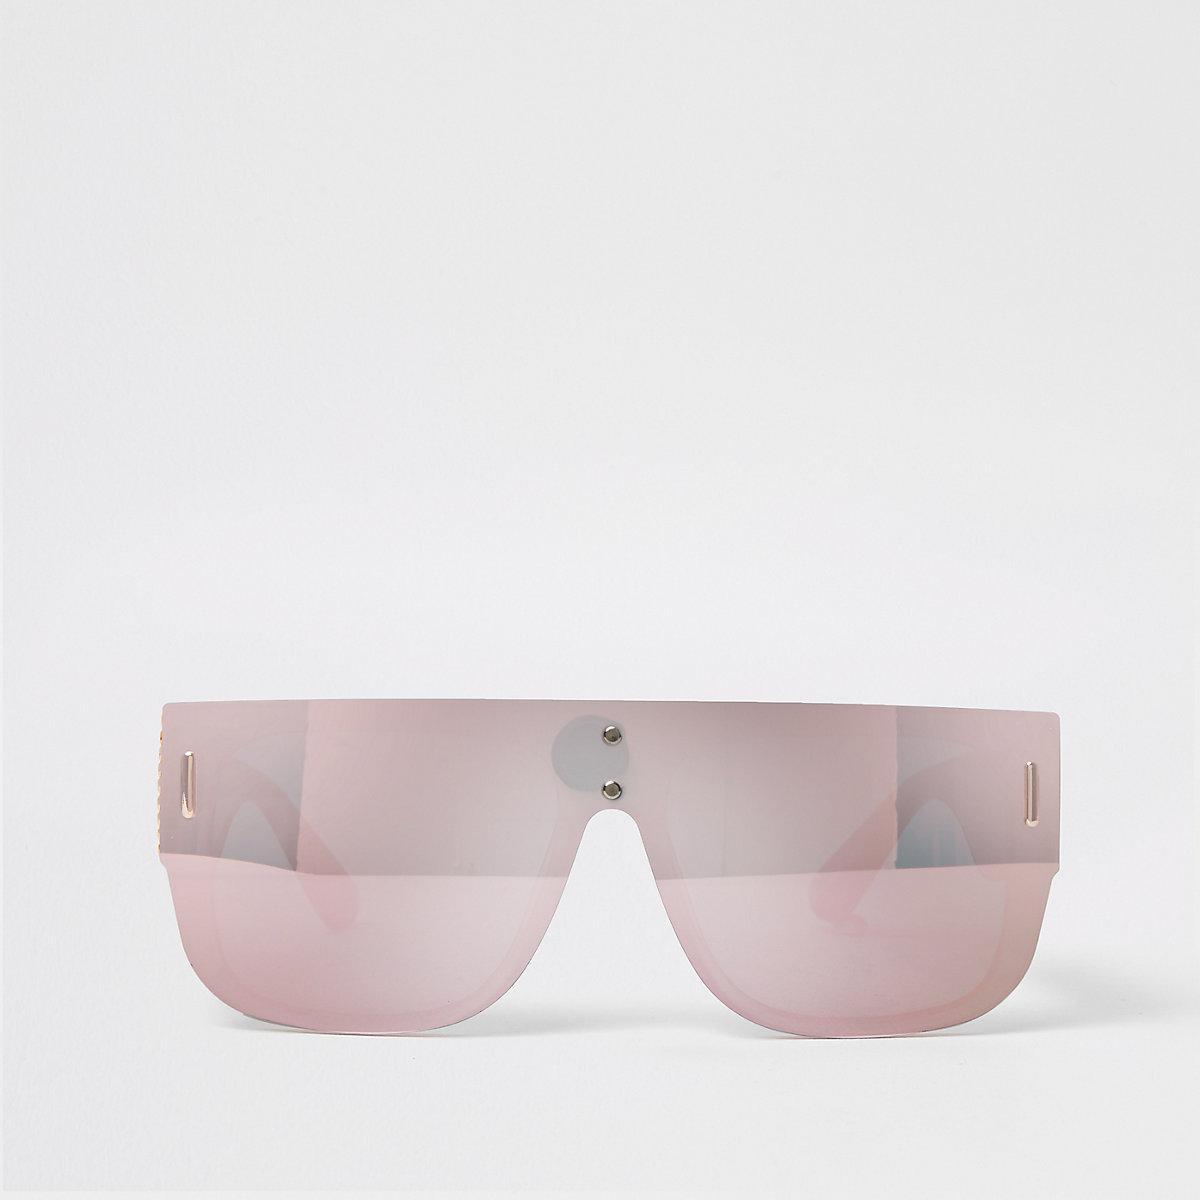 Silver mirror lens visor sunglasses